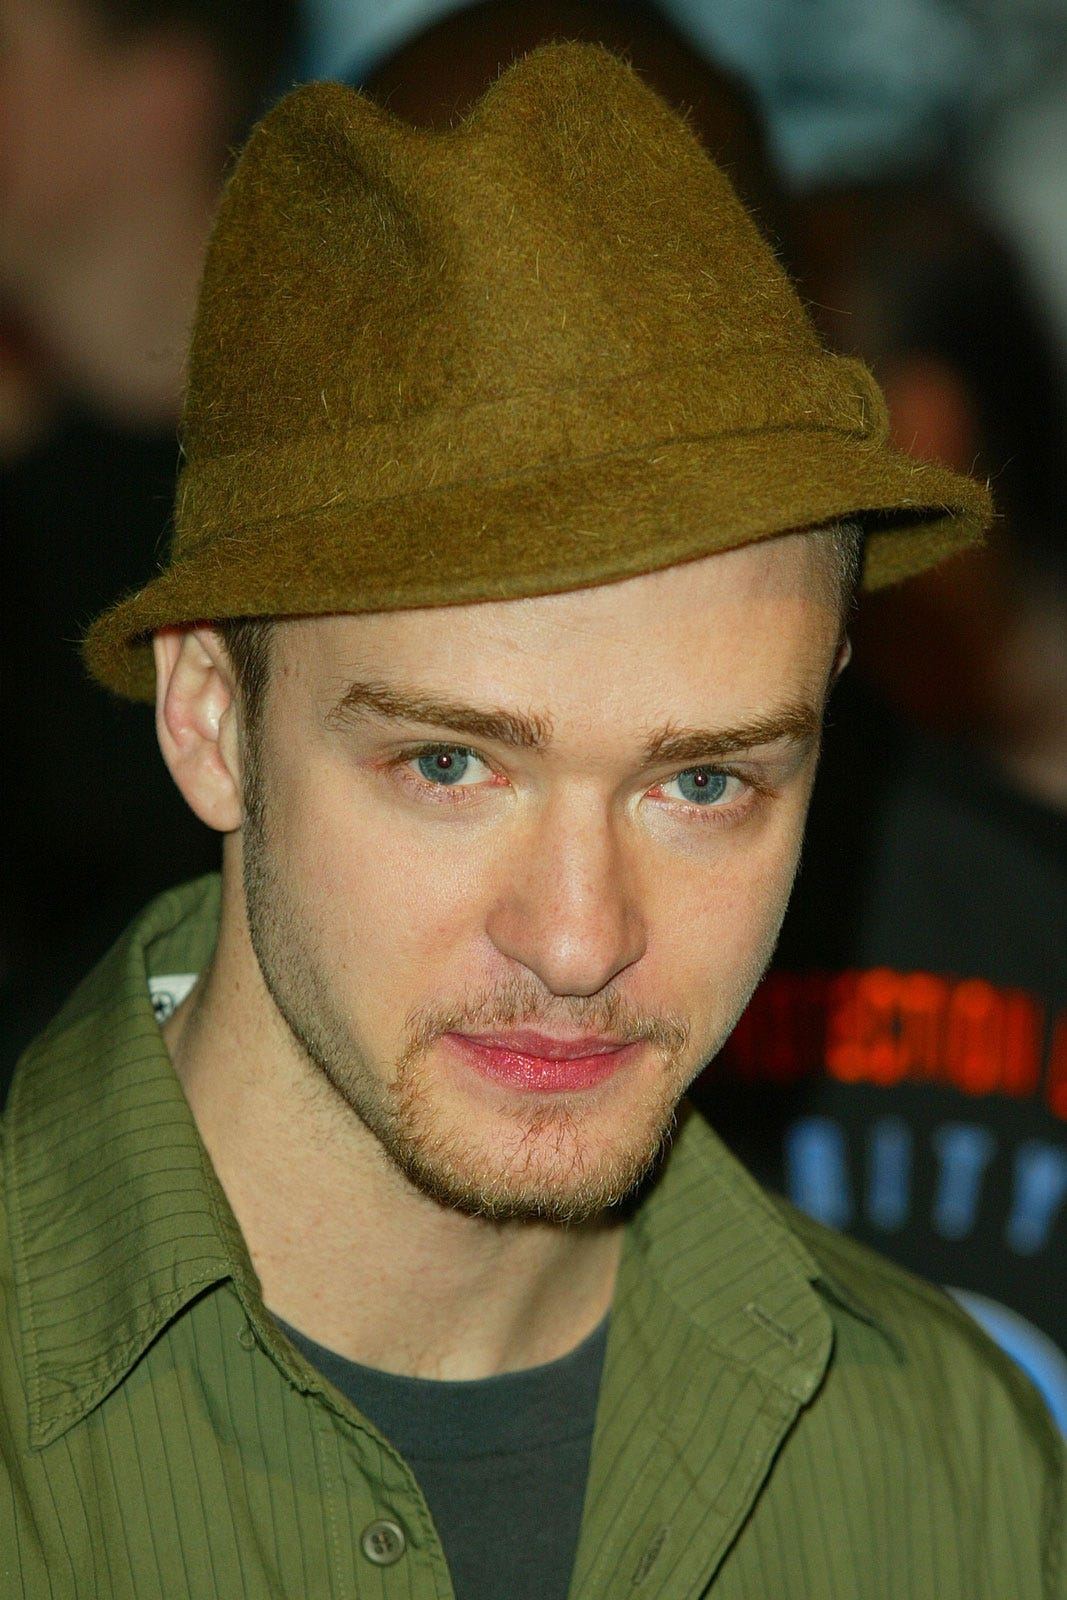 2ccfc1d7d69 Justin Timberlake Hair Style Transformation Throwback